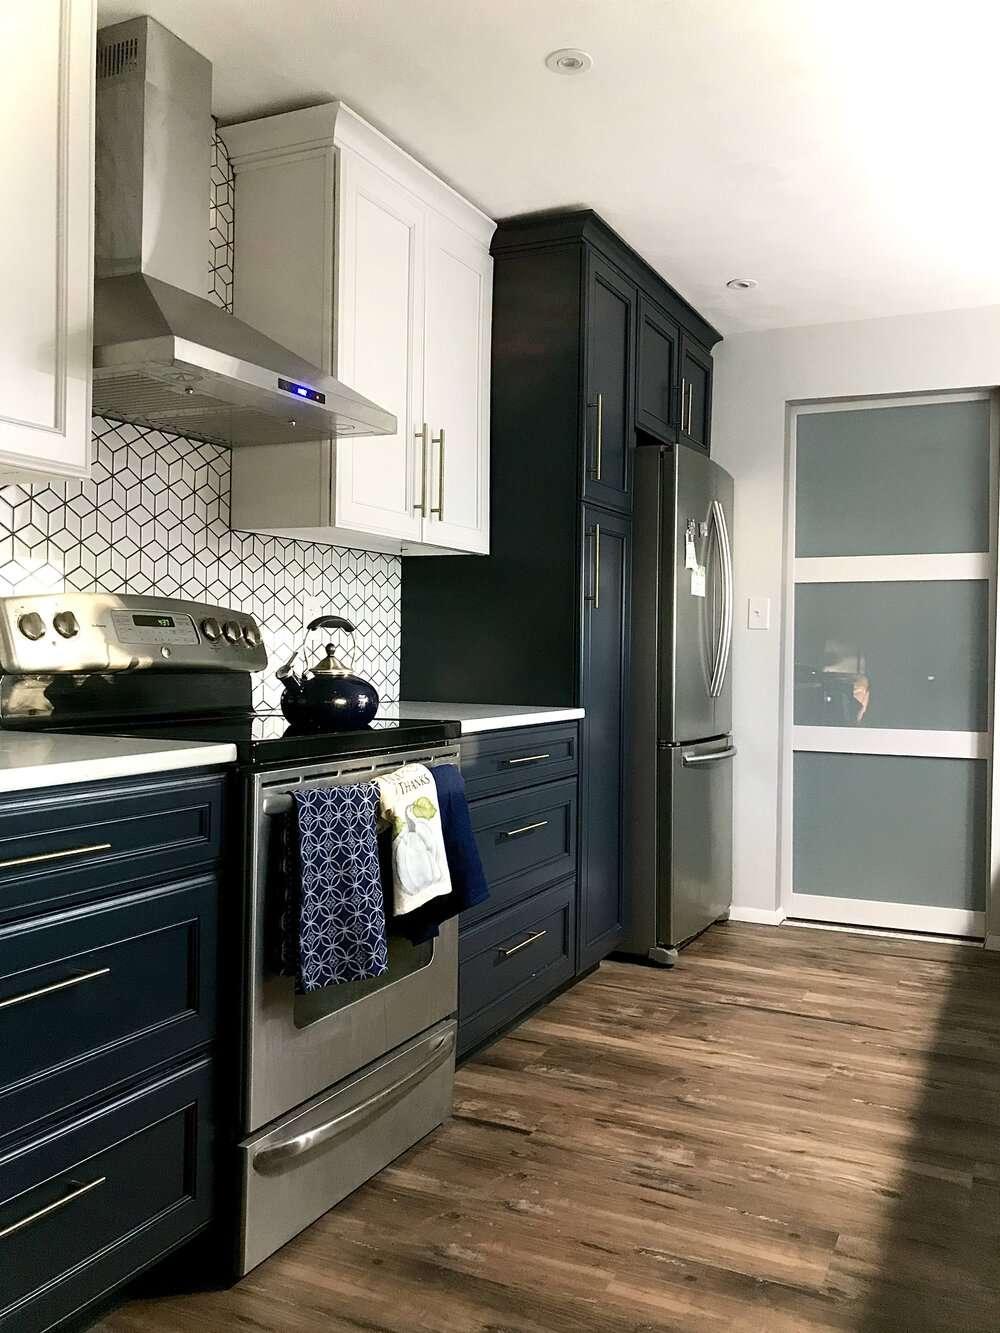 best kitchen ideas - blue cabinets with patterned backsplash